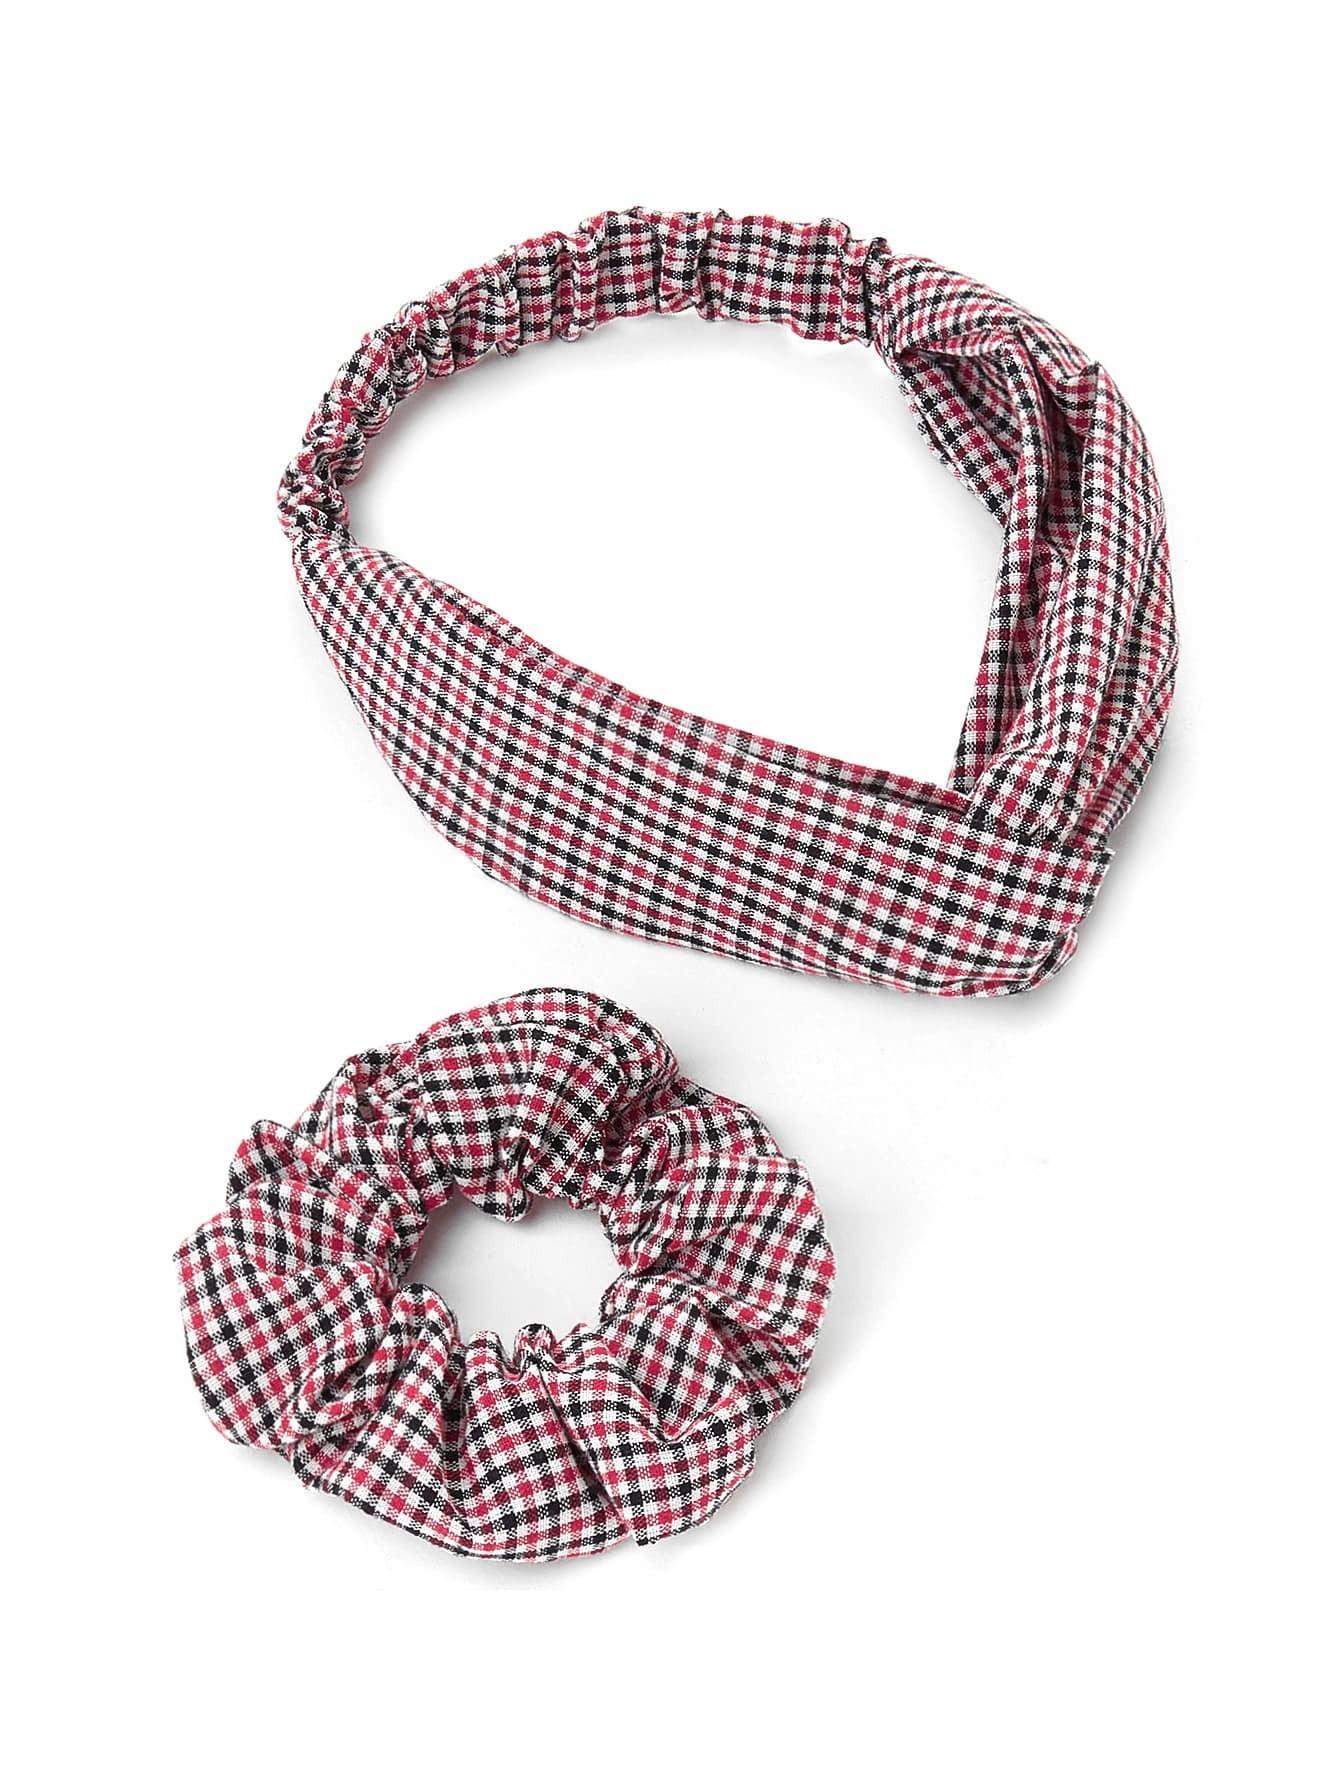 Gingham Print Headband   Hair Tie 2pcs -SheIn(Sheinside) 3c9838d79c7